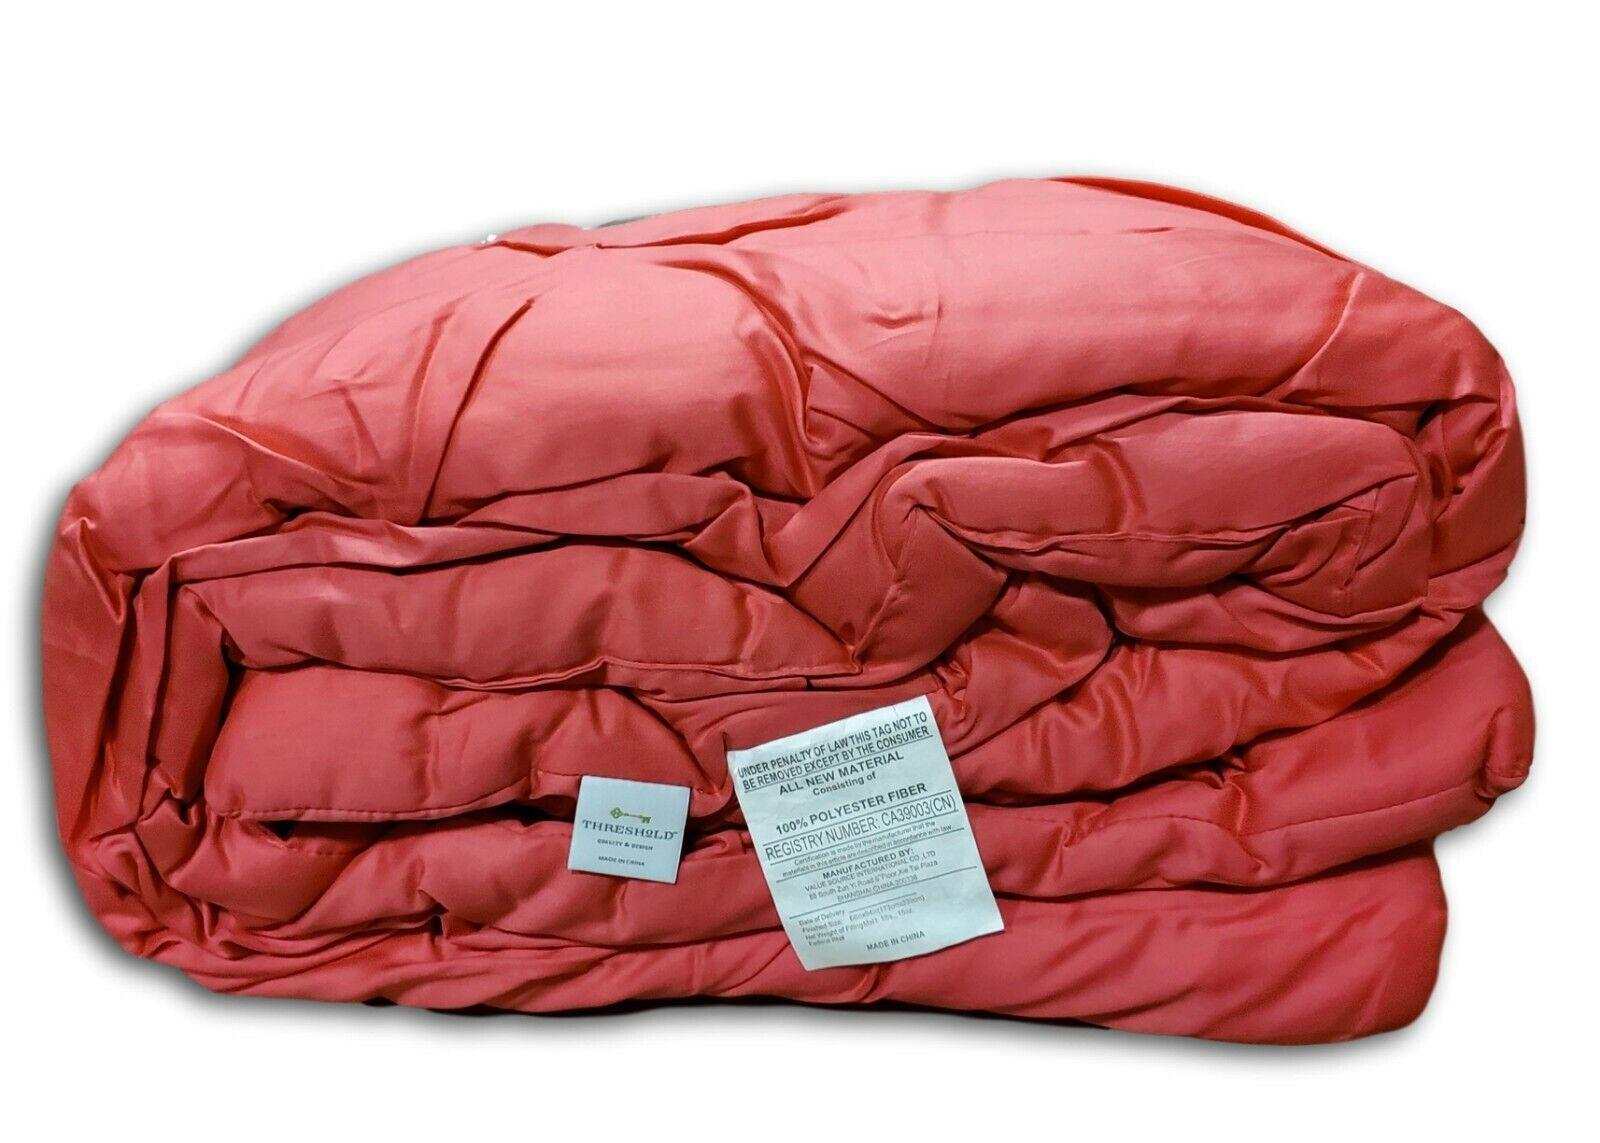 Threshold Pinched Pleat Bedding Comforter Set –  Honeysuckle Rose Pink (Twin) Bedding